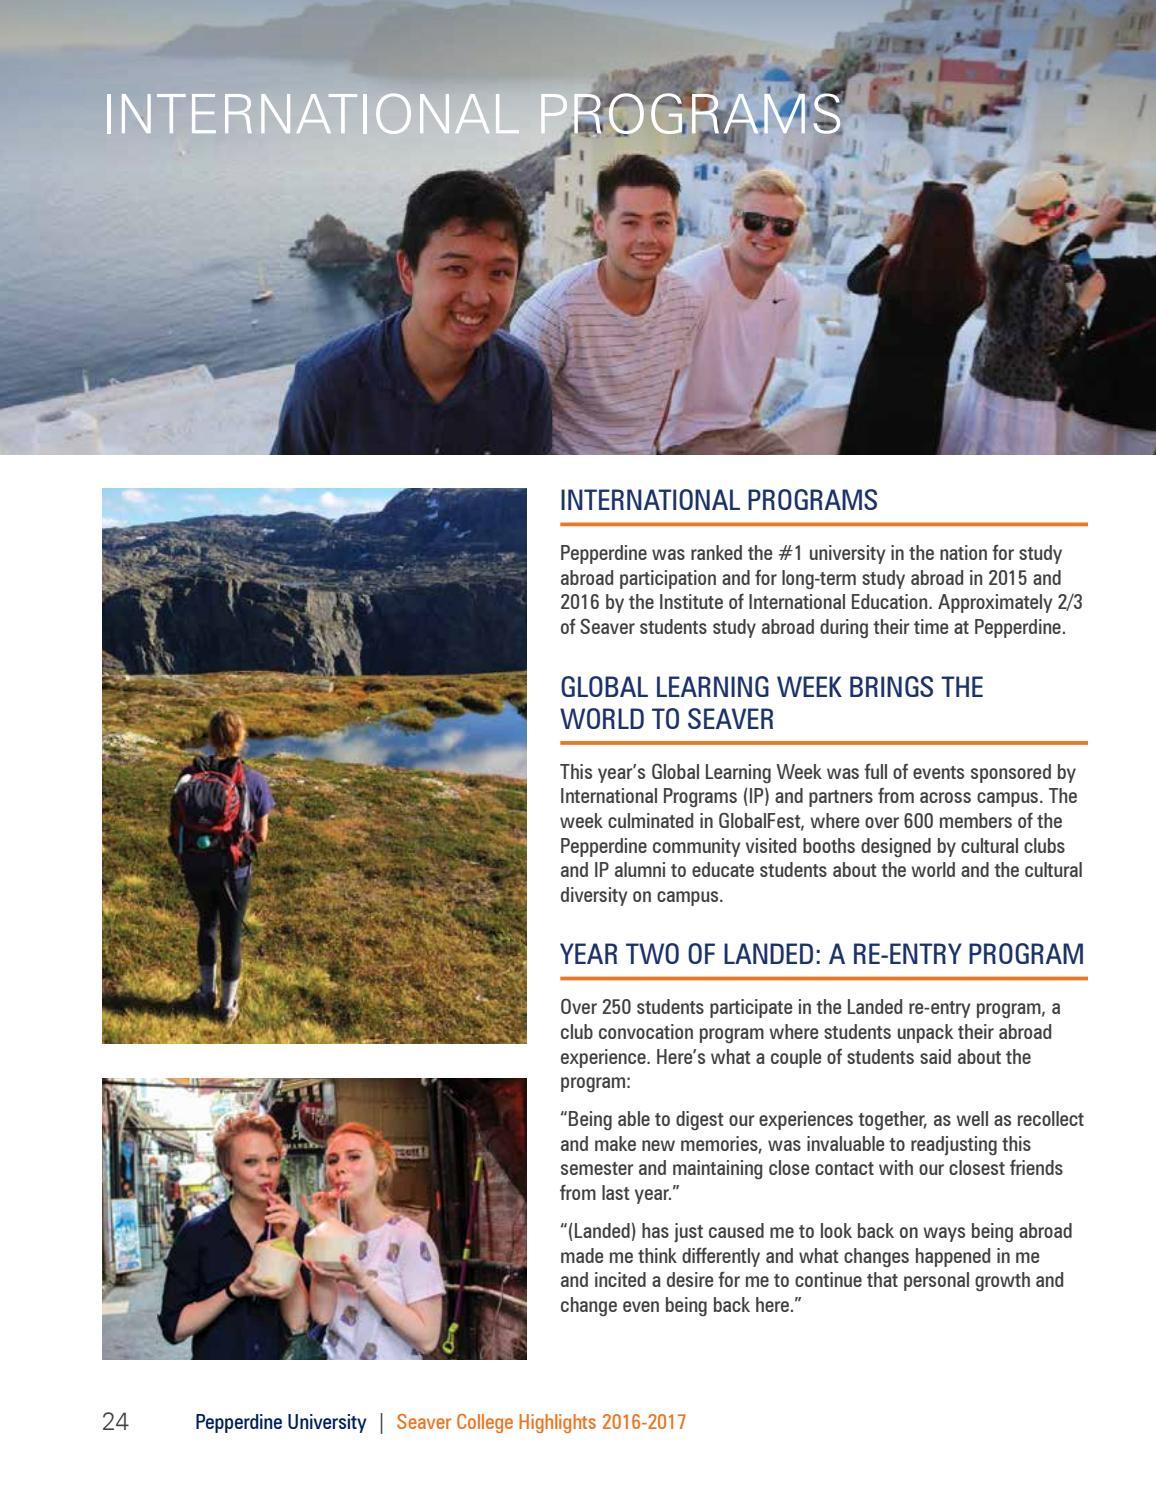 Seaver College Highlights 2016-17 by Pepperdine University